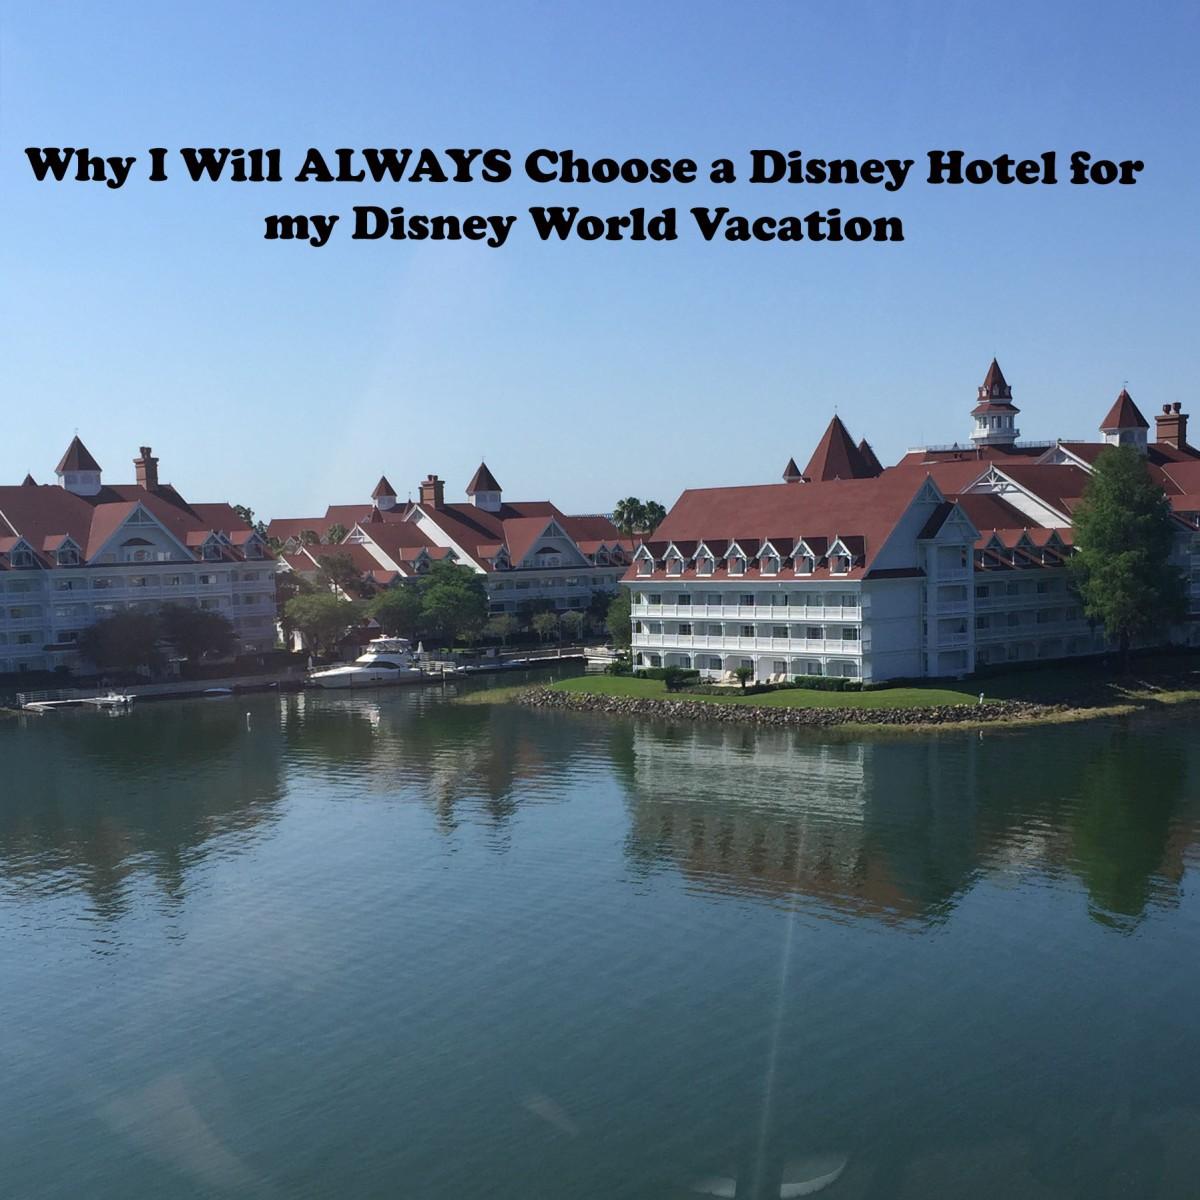 Why I Will ALWAYS Choose a Disney Hotel for my Disney WorldVacation